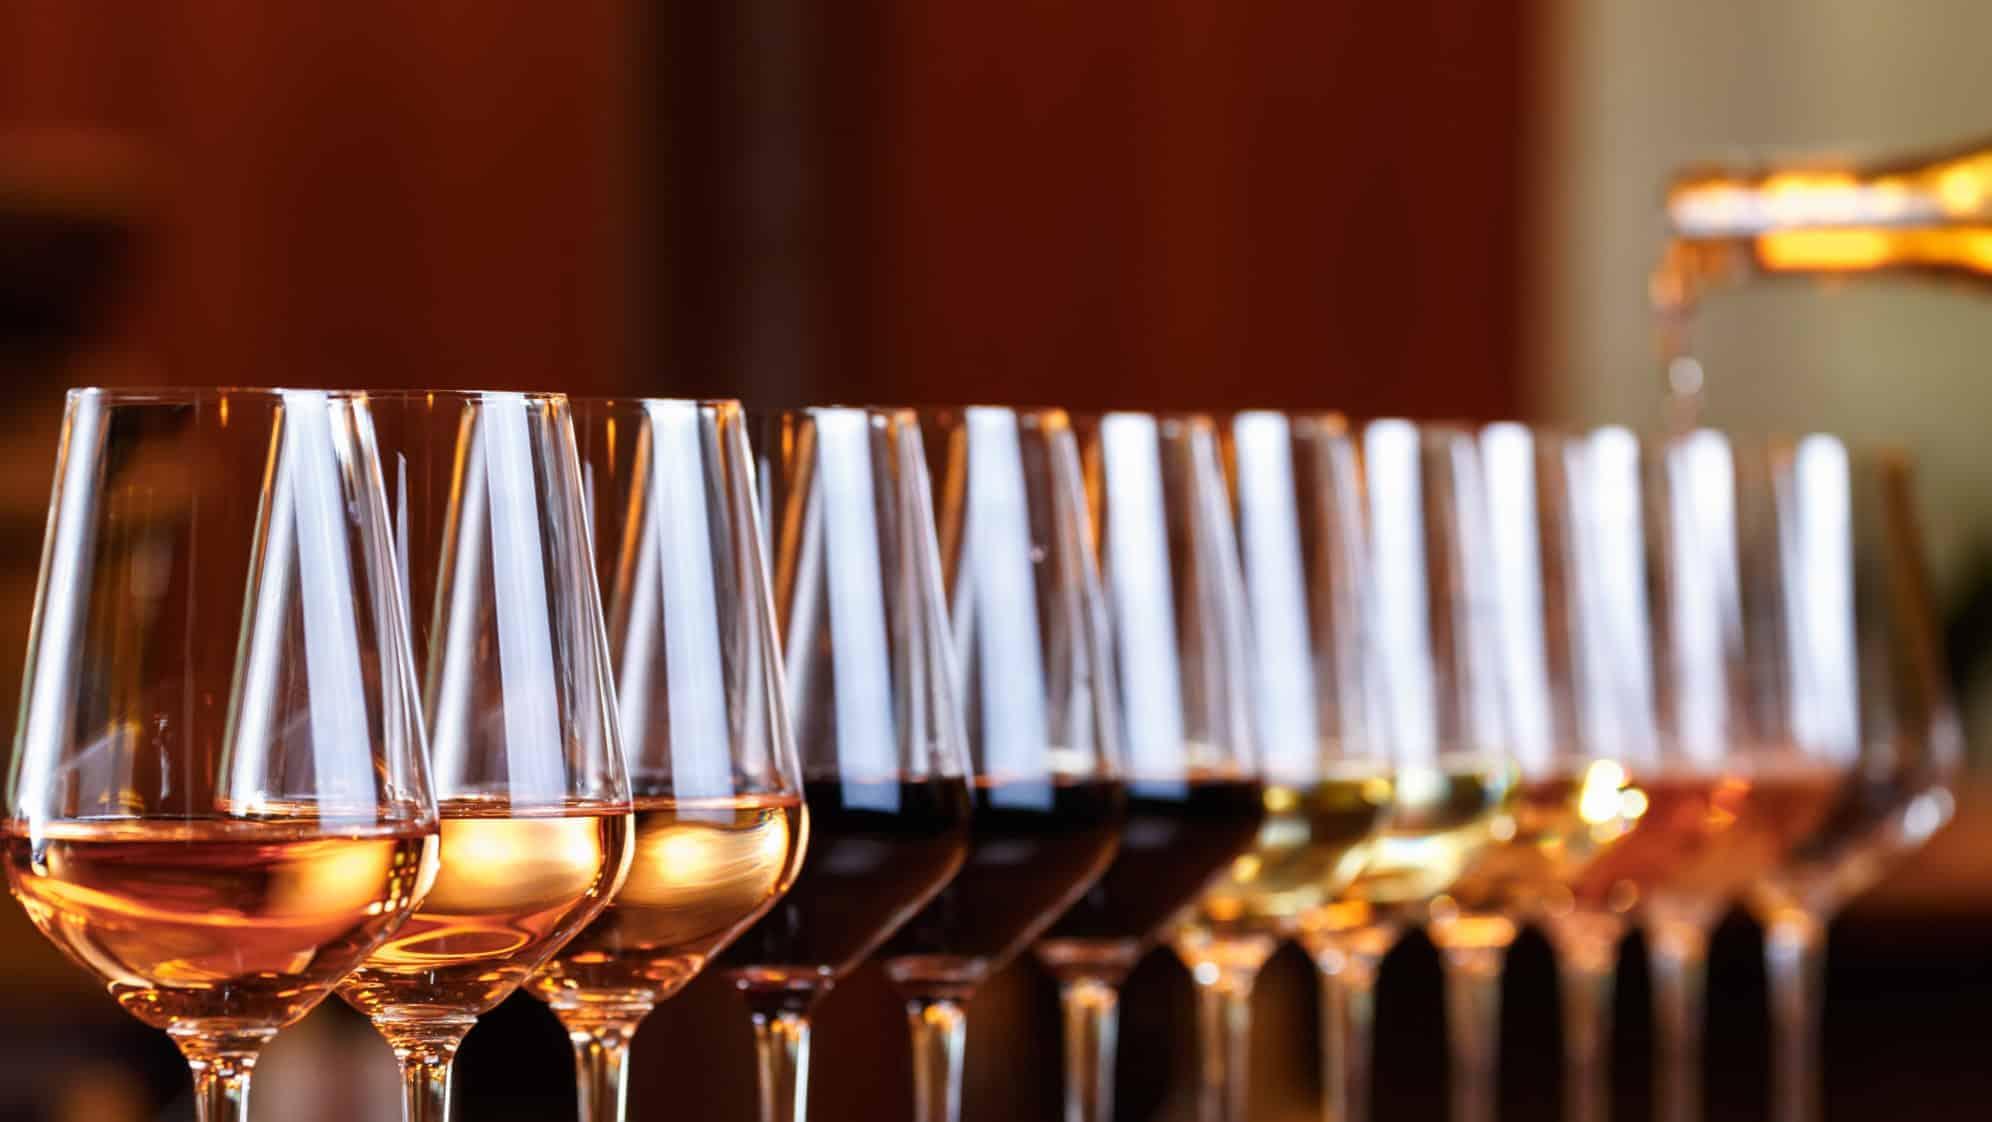 Global Wine Partners, LLC